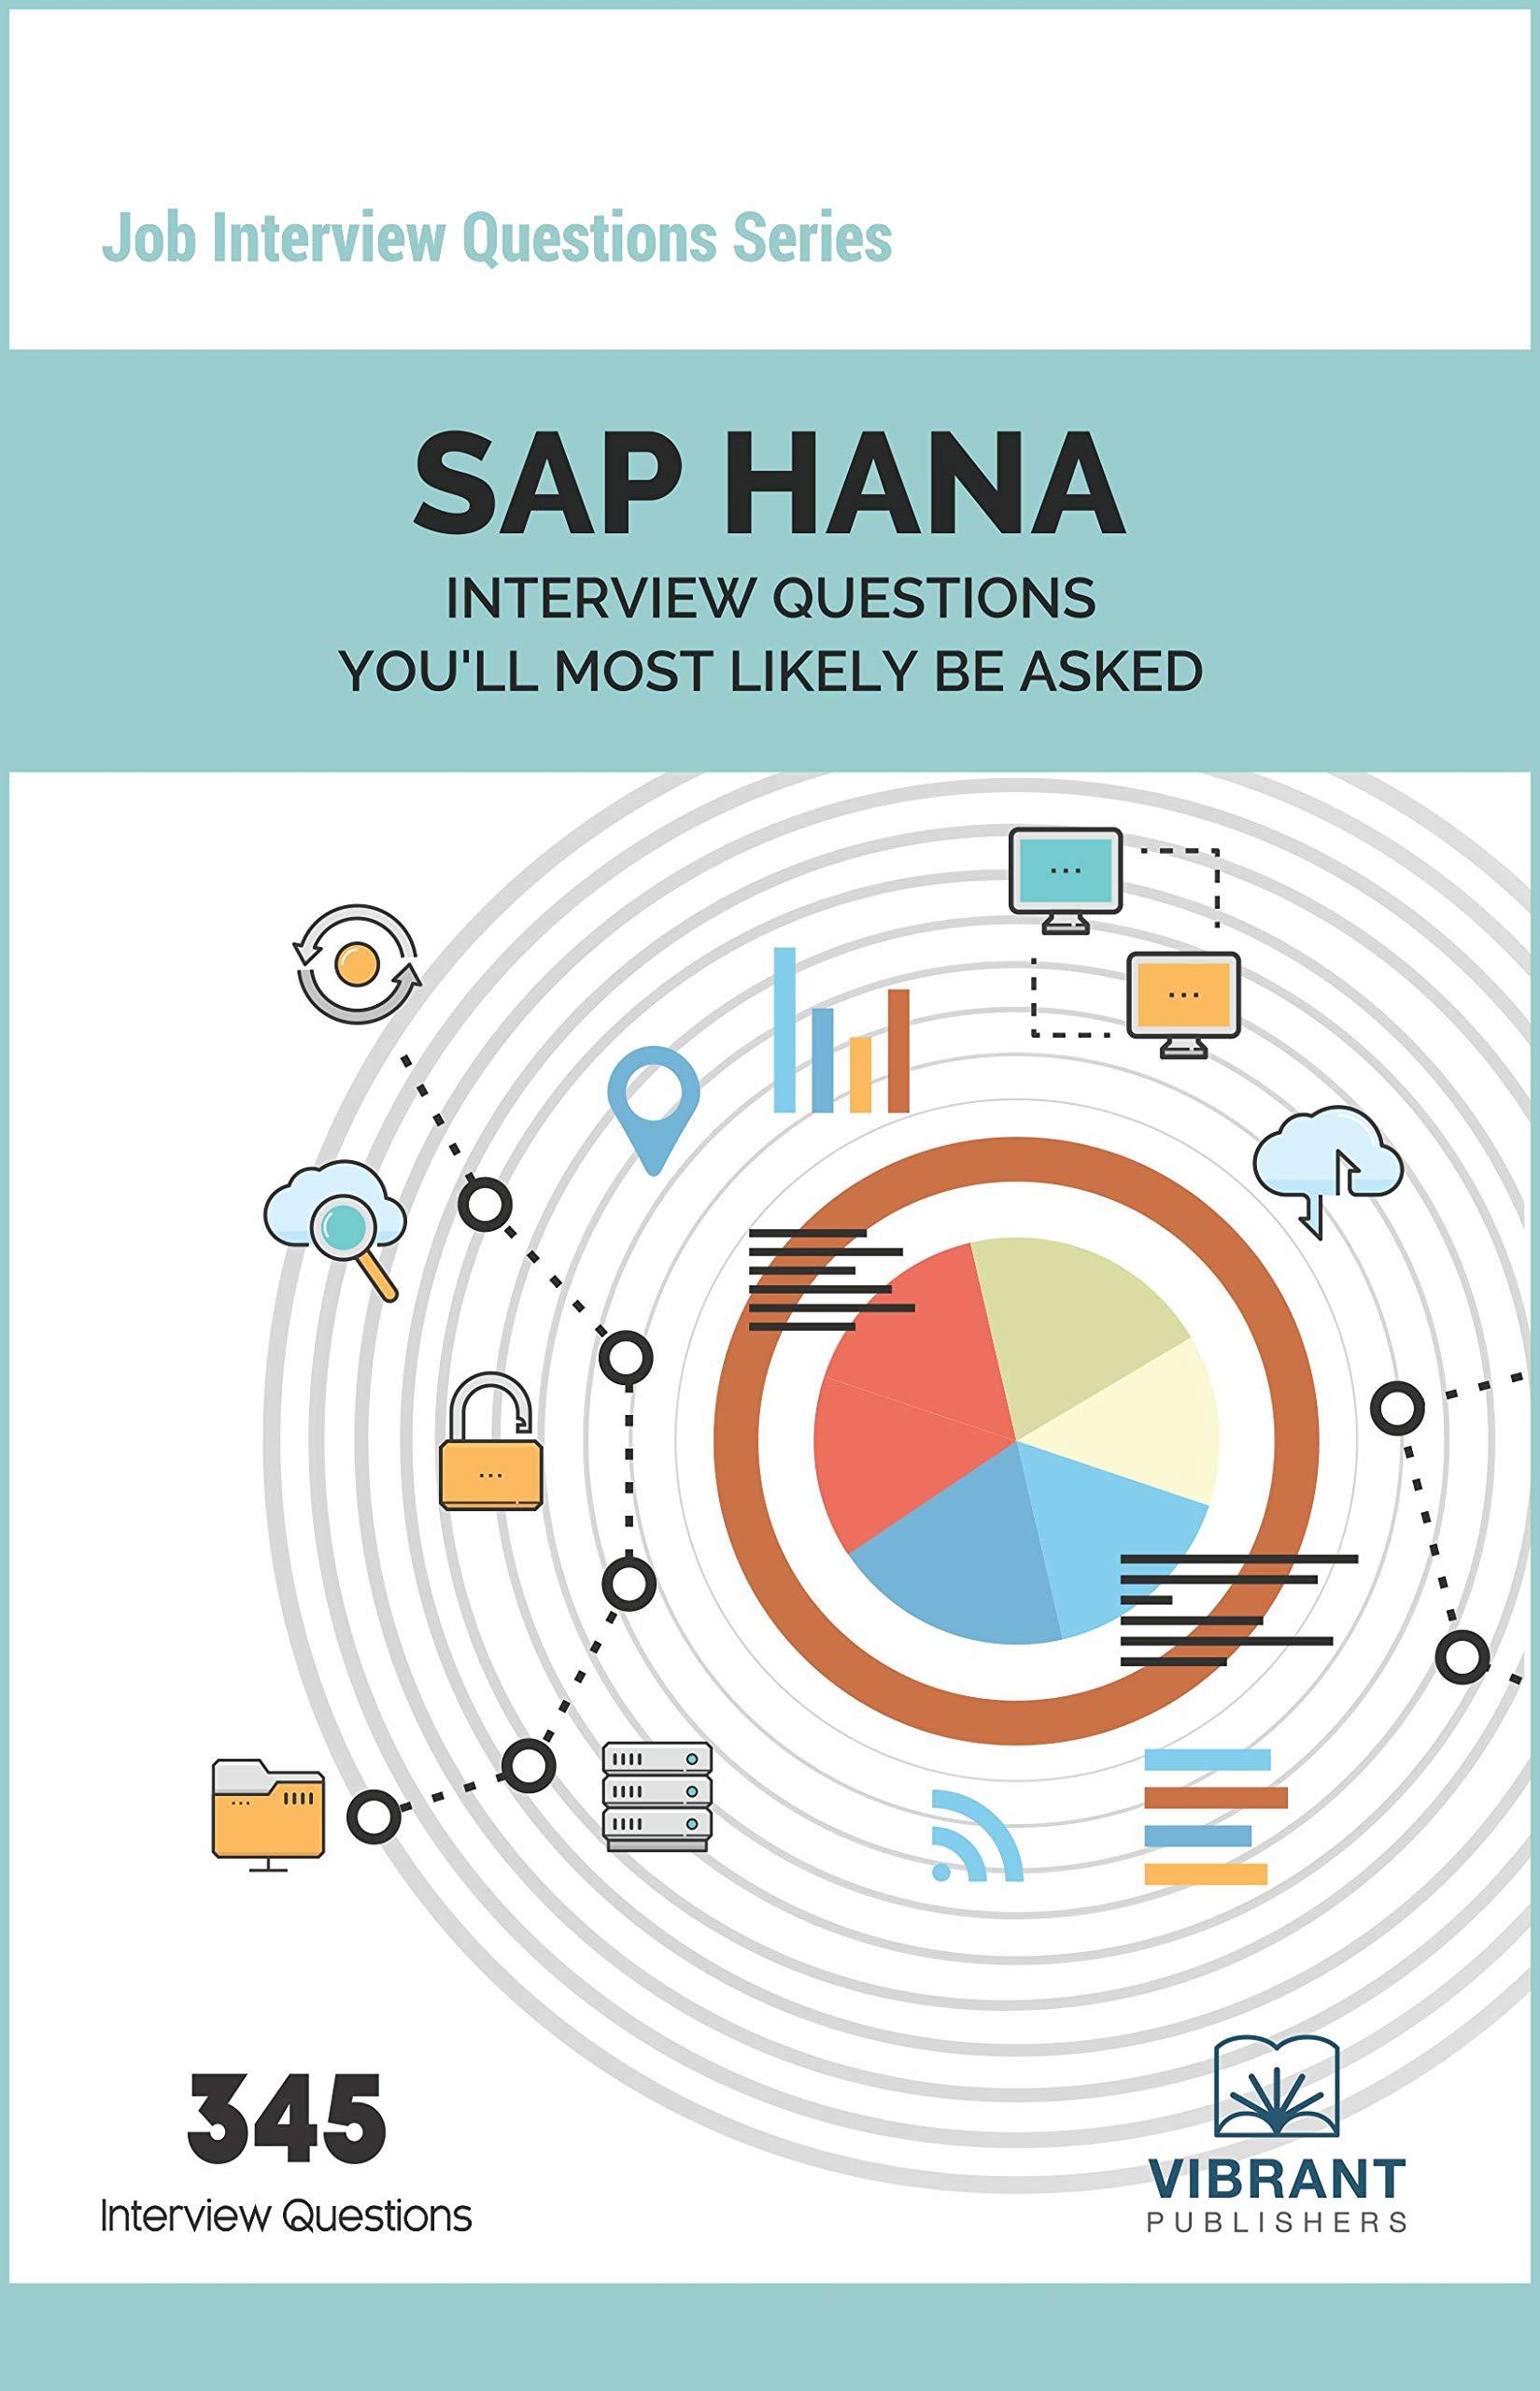 SAP HANA Interview Questions: Volume 22 (Job Interview Questions) [Paperback] Vibrant Publishers